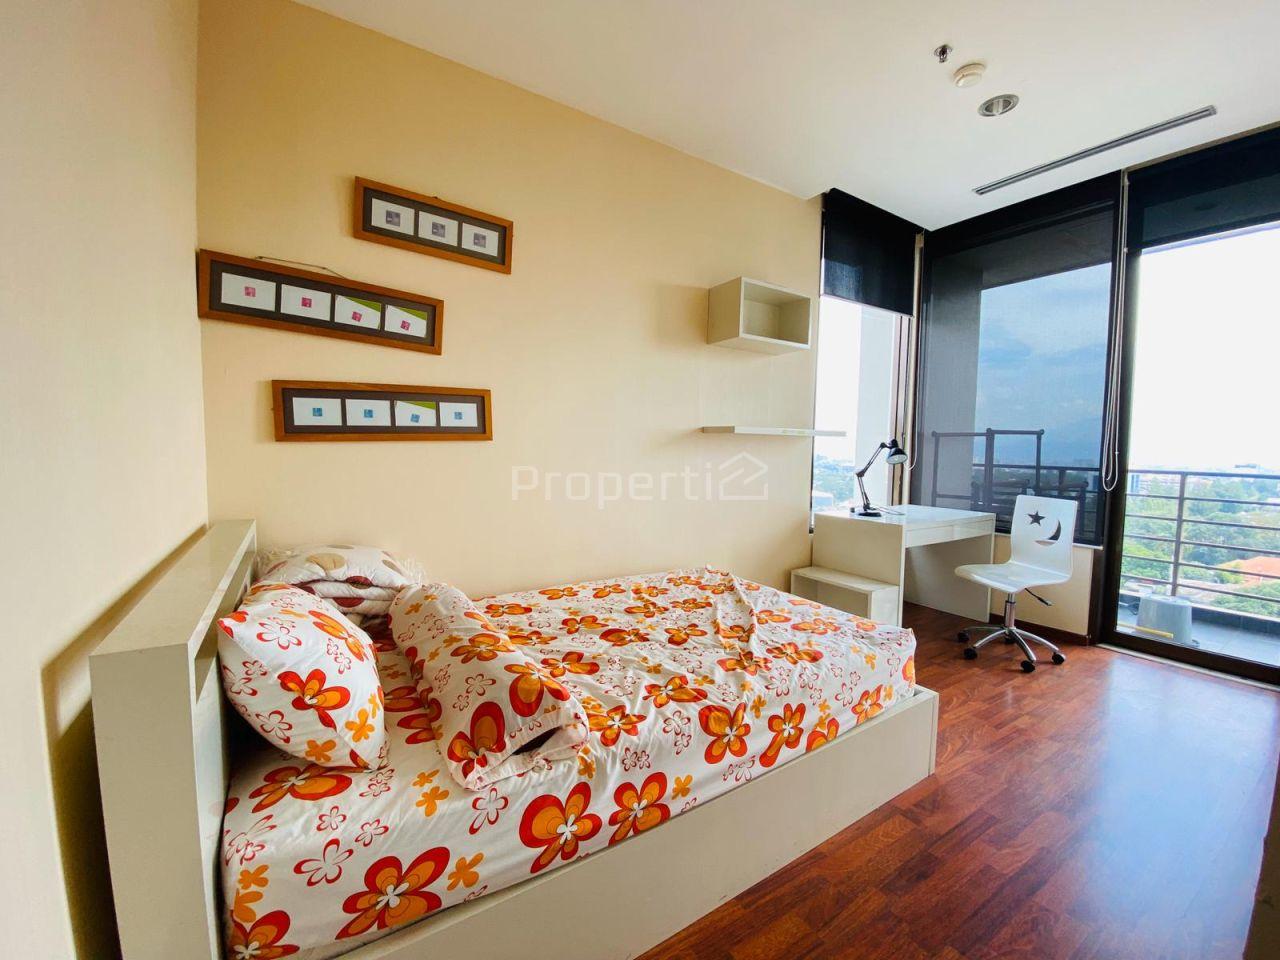 2BR Unit at Dago Butik Apartment, 9th Floor, Coblong